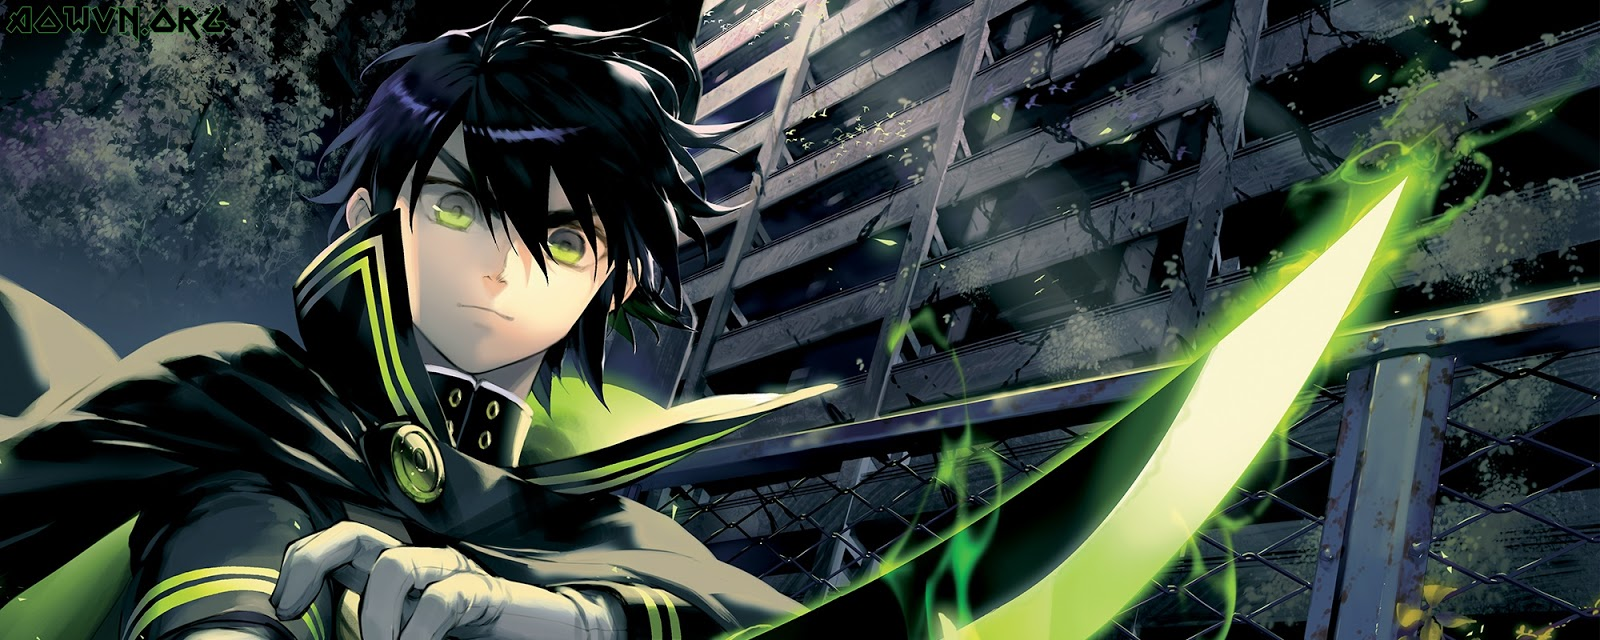 5395 SeriesHeader Tier02 SPH 2000x800 - [ Anime 3gp Mp4 ] Owari no Seraph SS1 + SS2 + OVA | Vietsub - Hấp dẫn